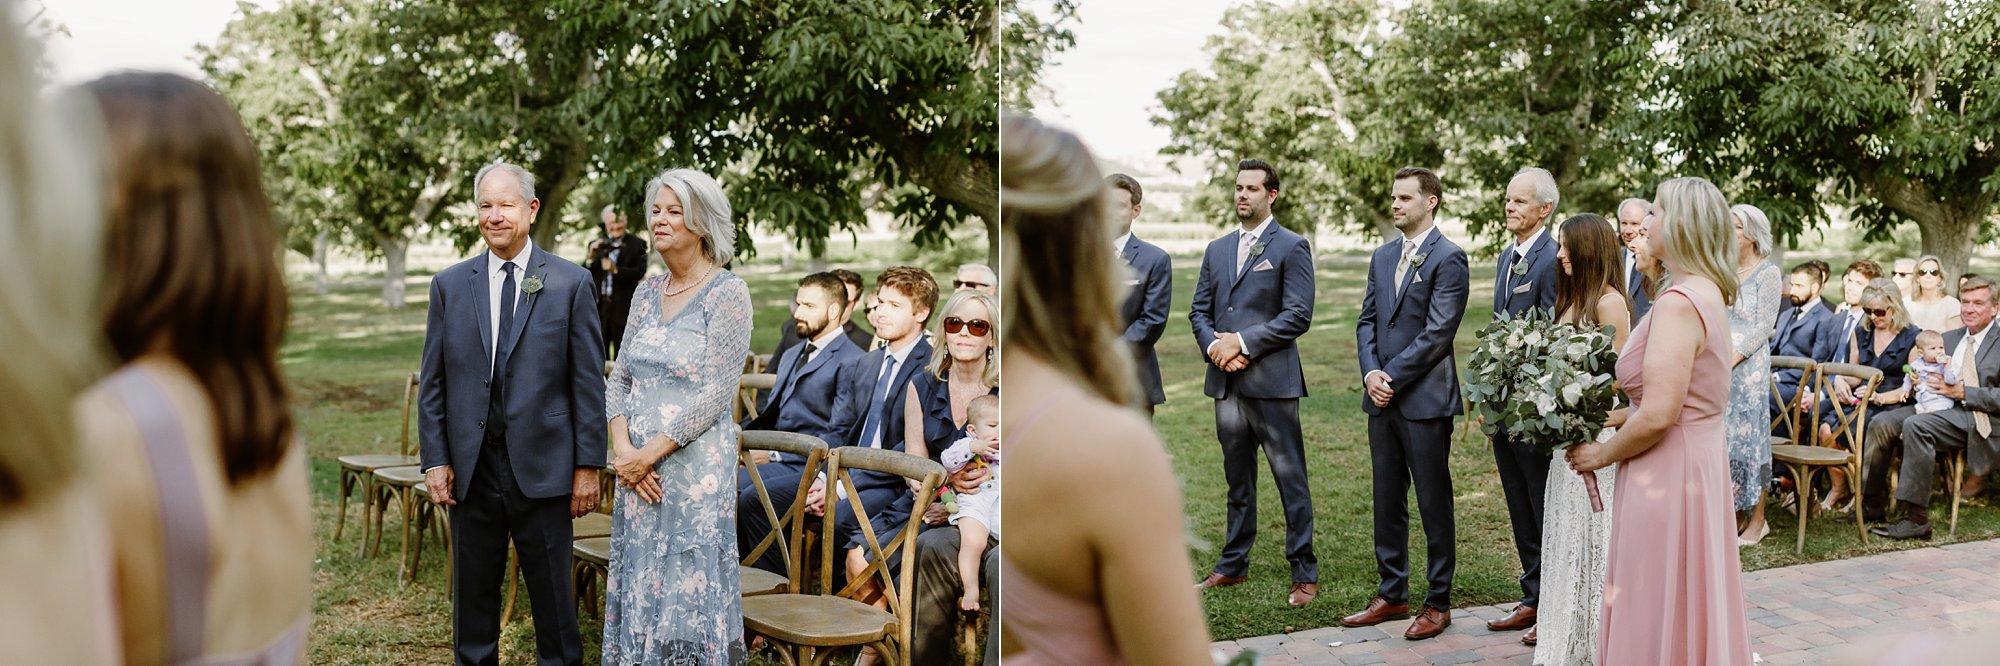 Walnut Grove Moorpark California Wedding_0026.jpg